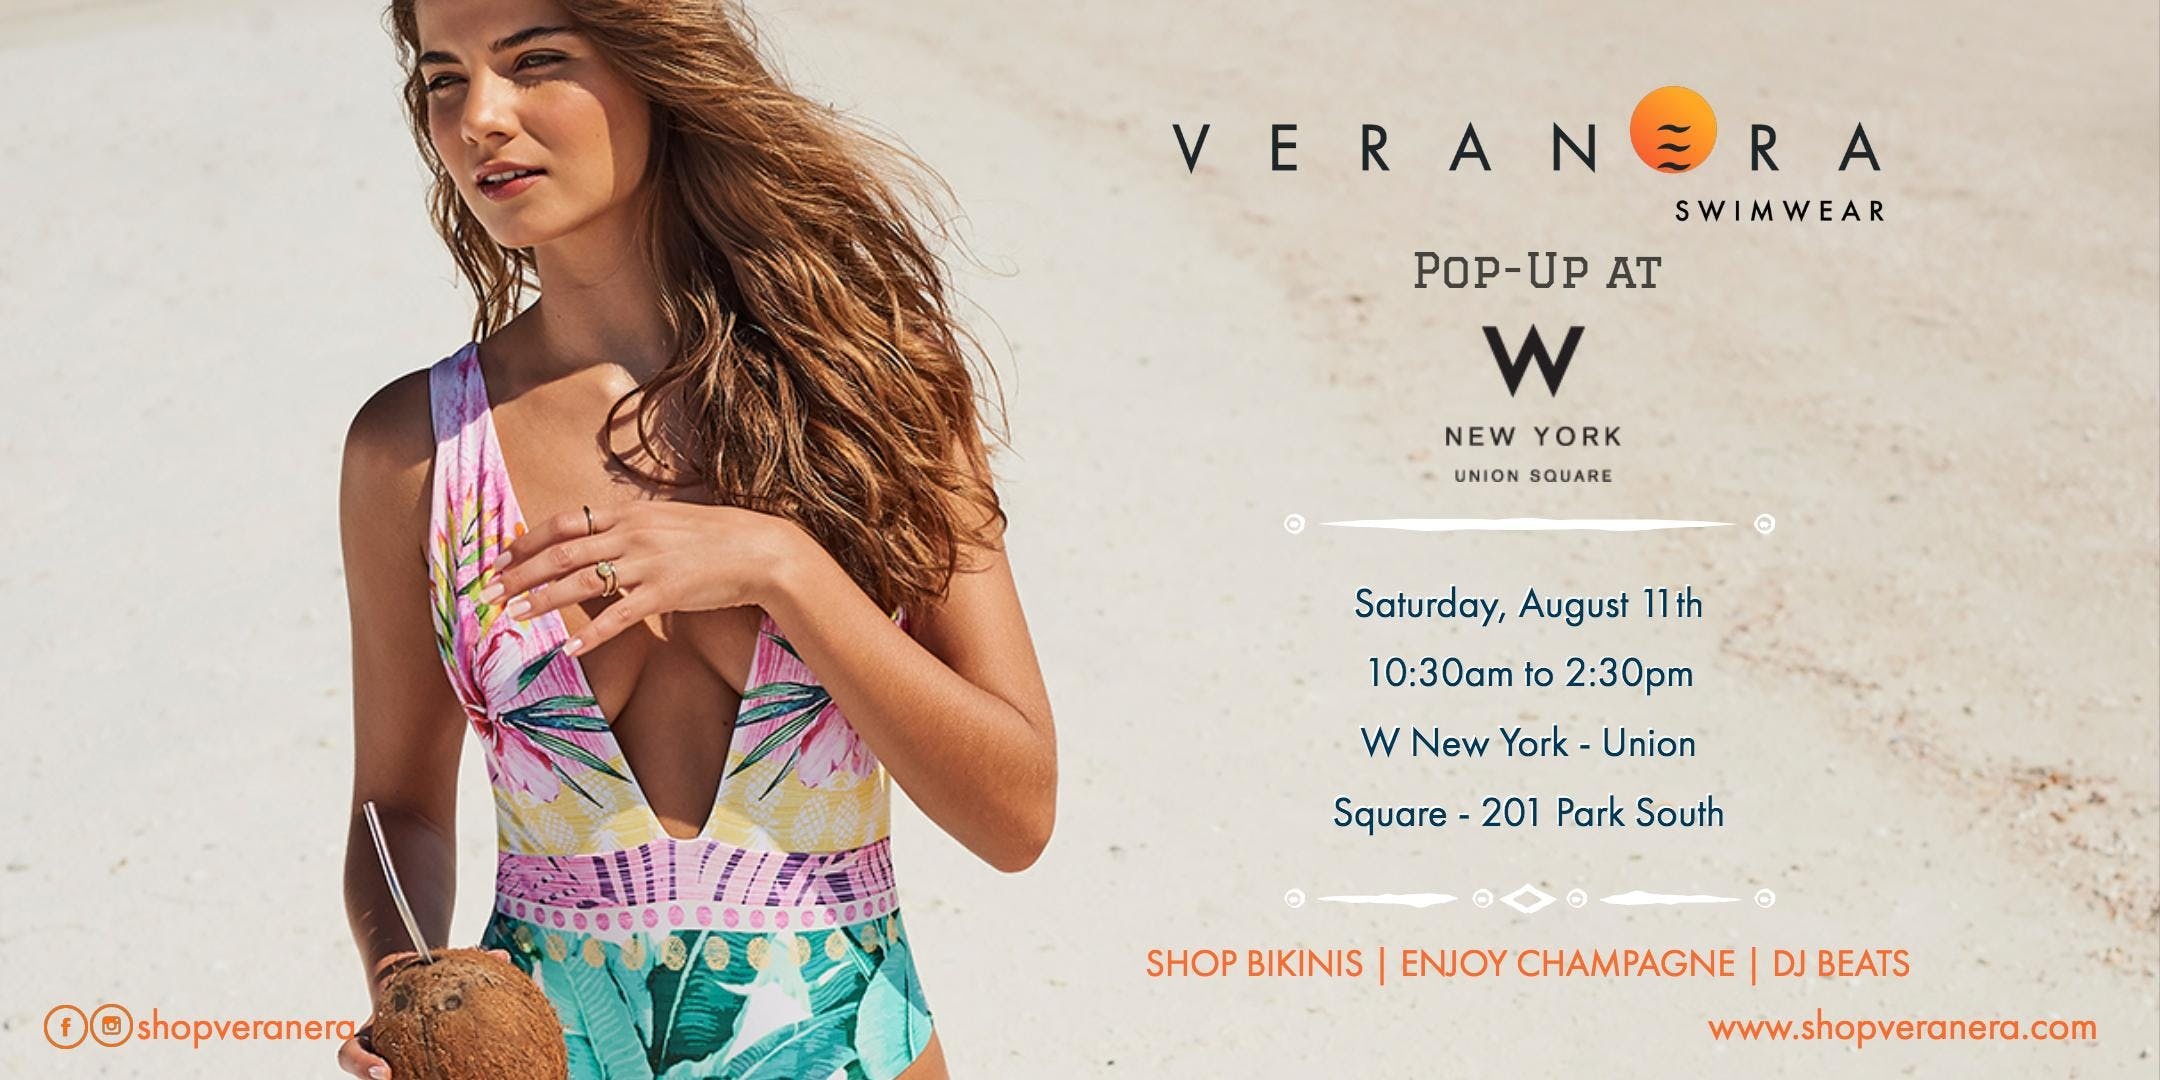 41e909154b7 Veranera Swimwear Pop-Up at W New York – Union Square - 11 AUG 2018